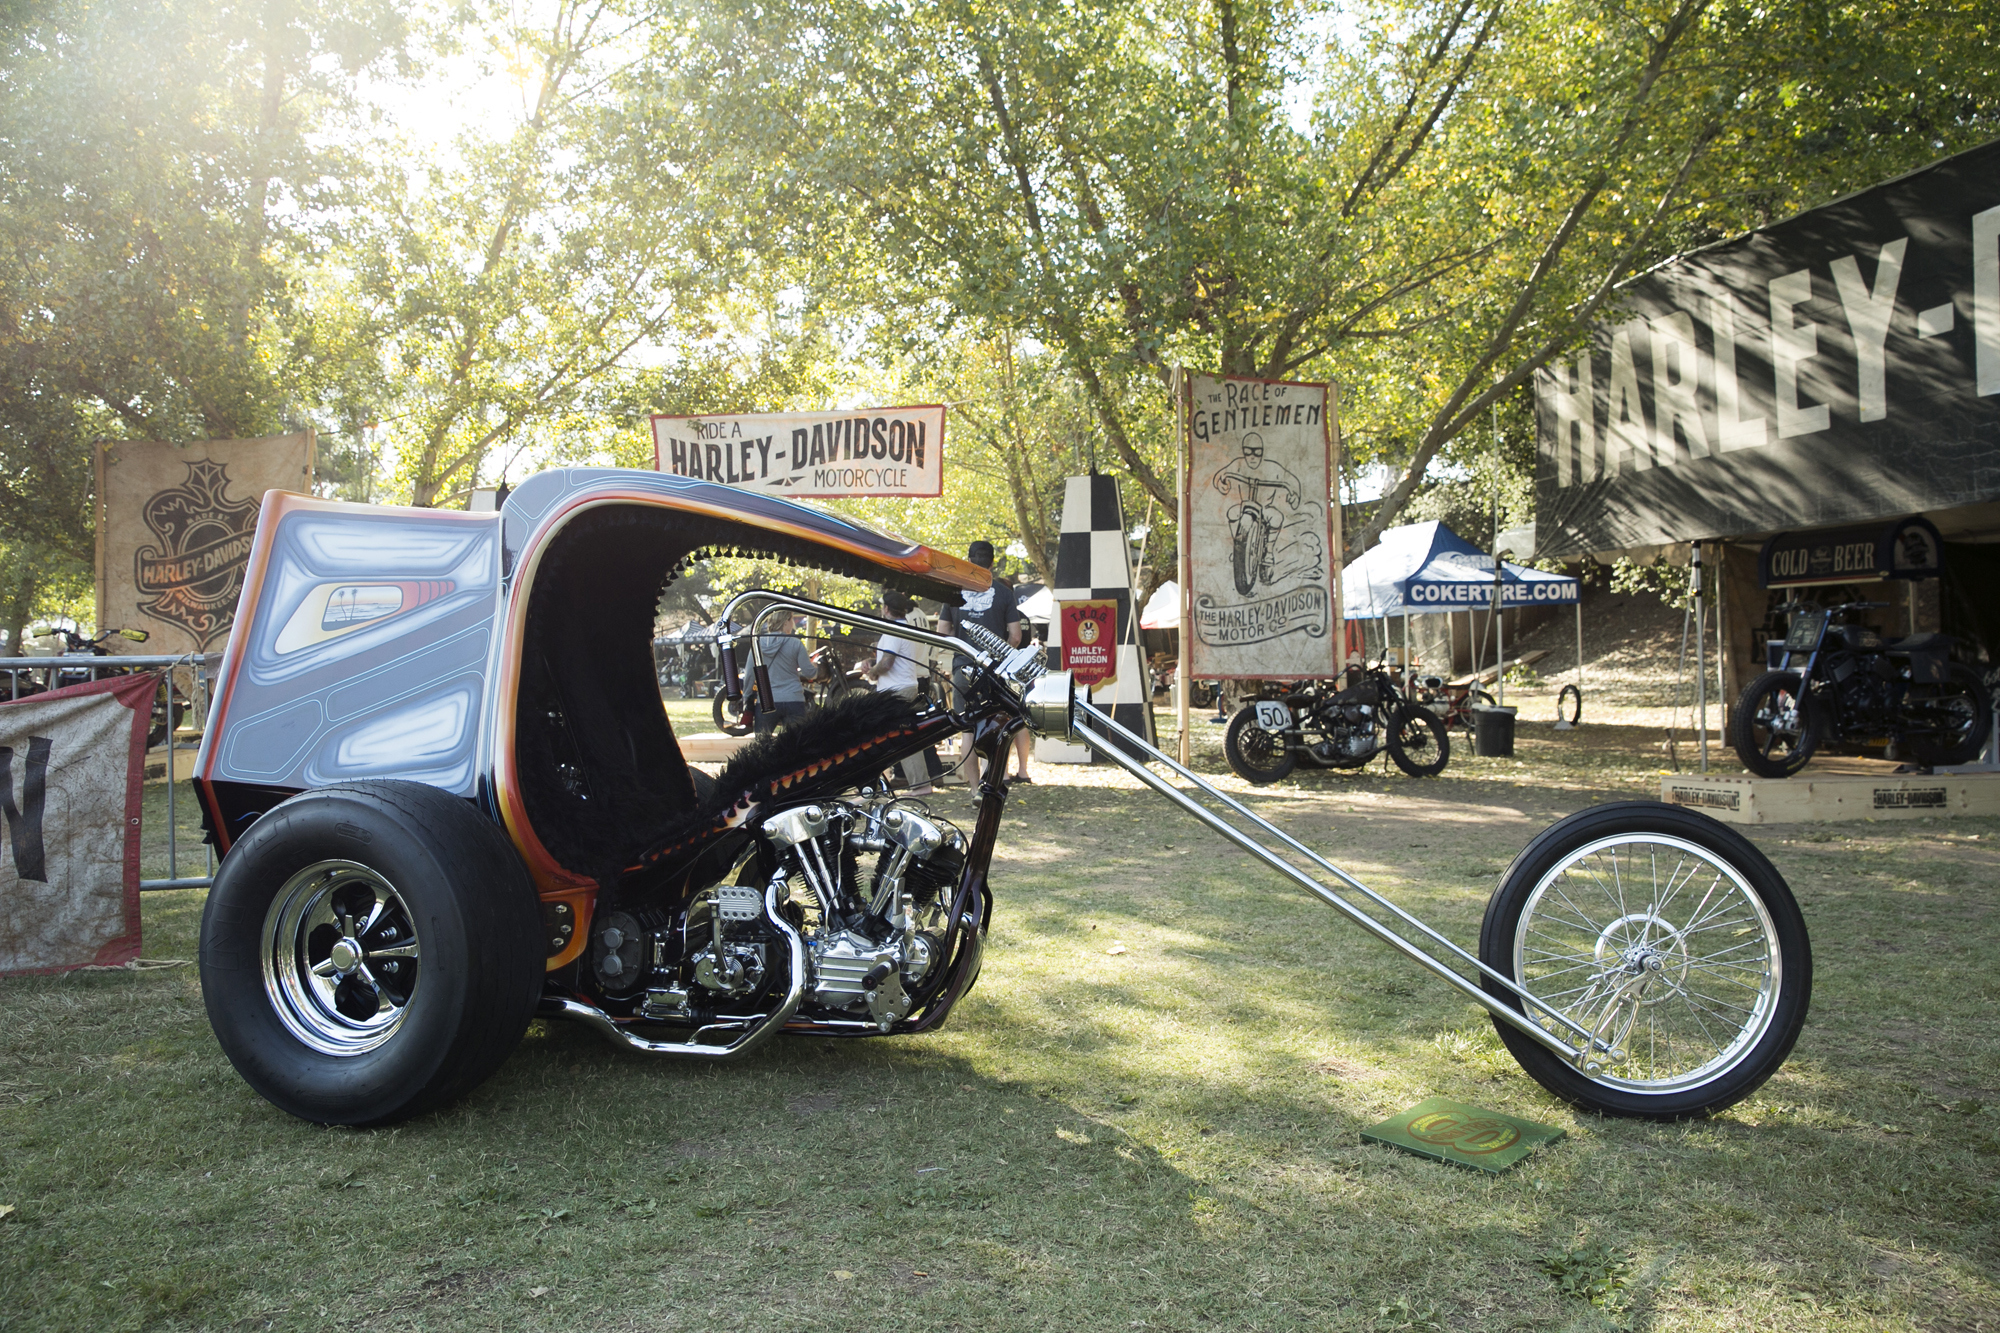 Born Free 8 Motorcycle Show-085.jpg